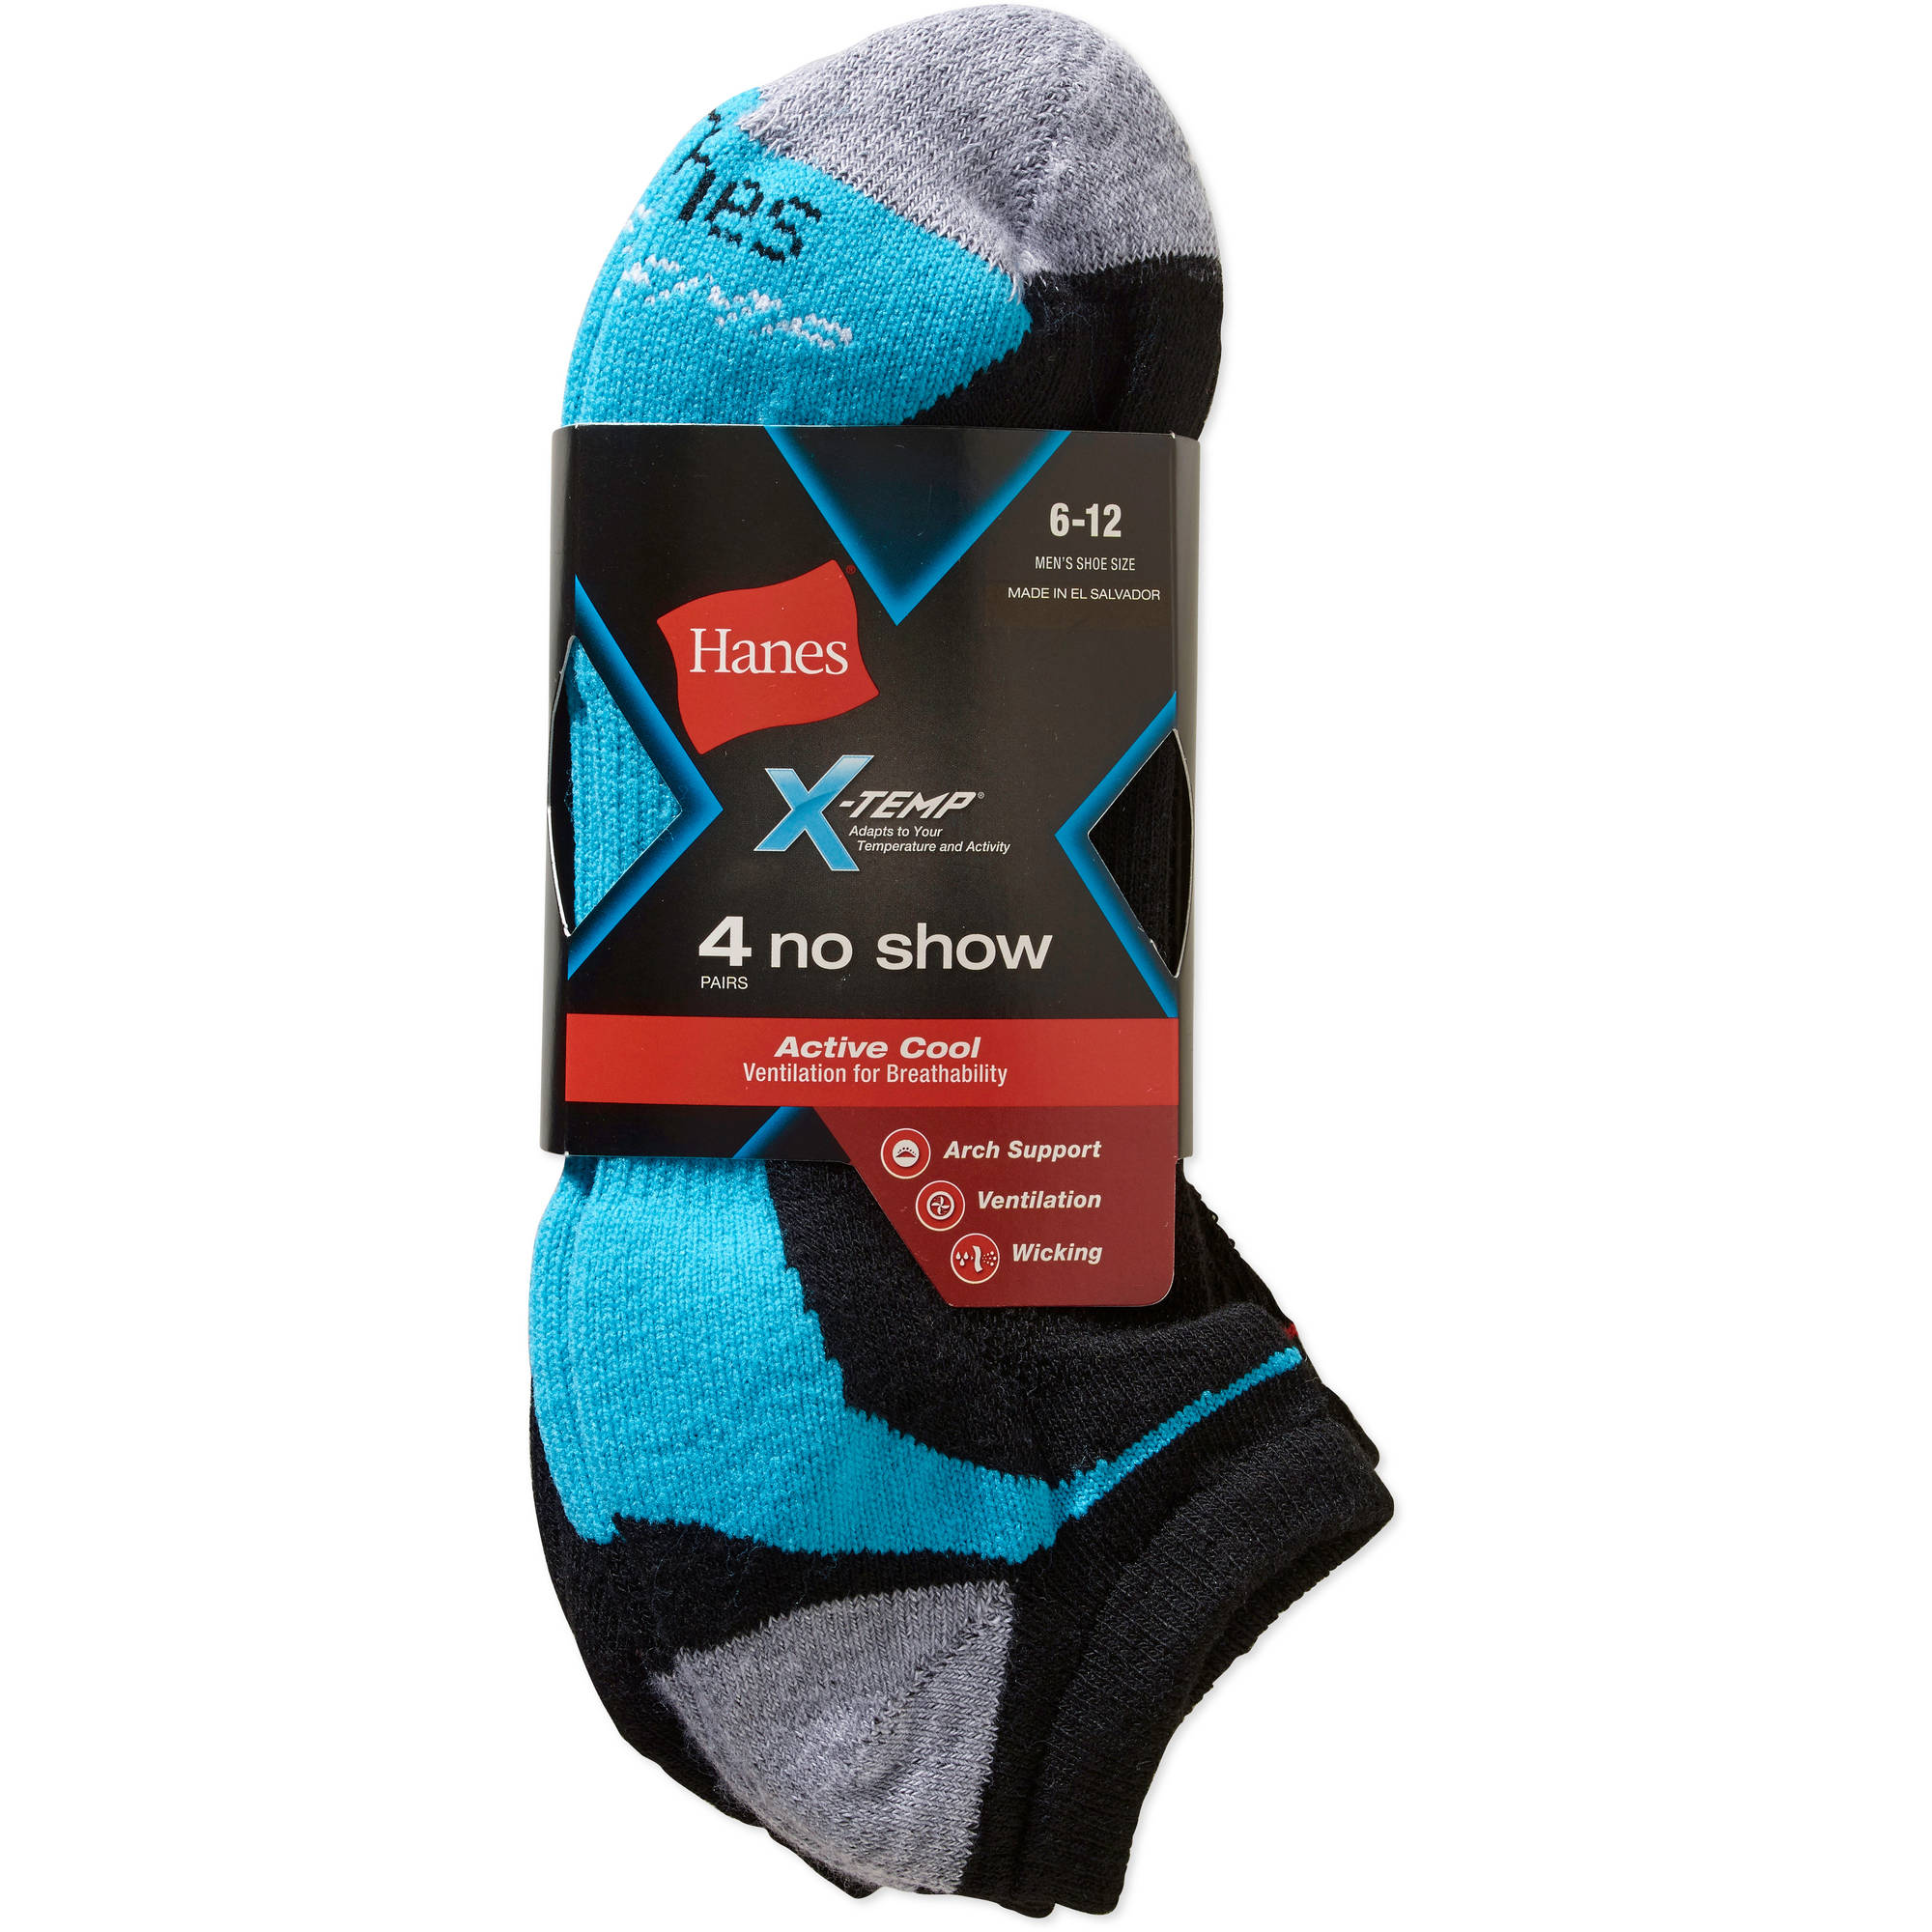 Details about  /4-Pack Hanes Men/'s X-Temp Arch Support Ventilation No-Show Socks Shoe size 6-12